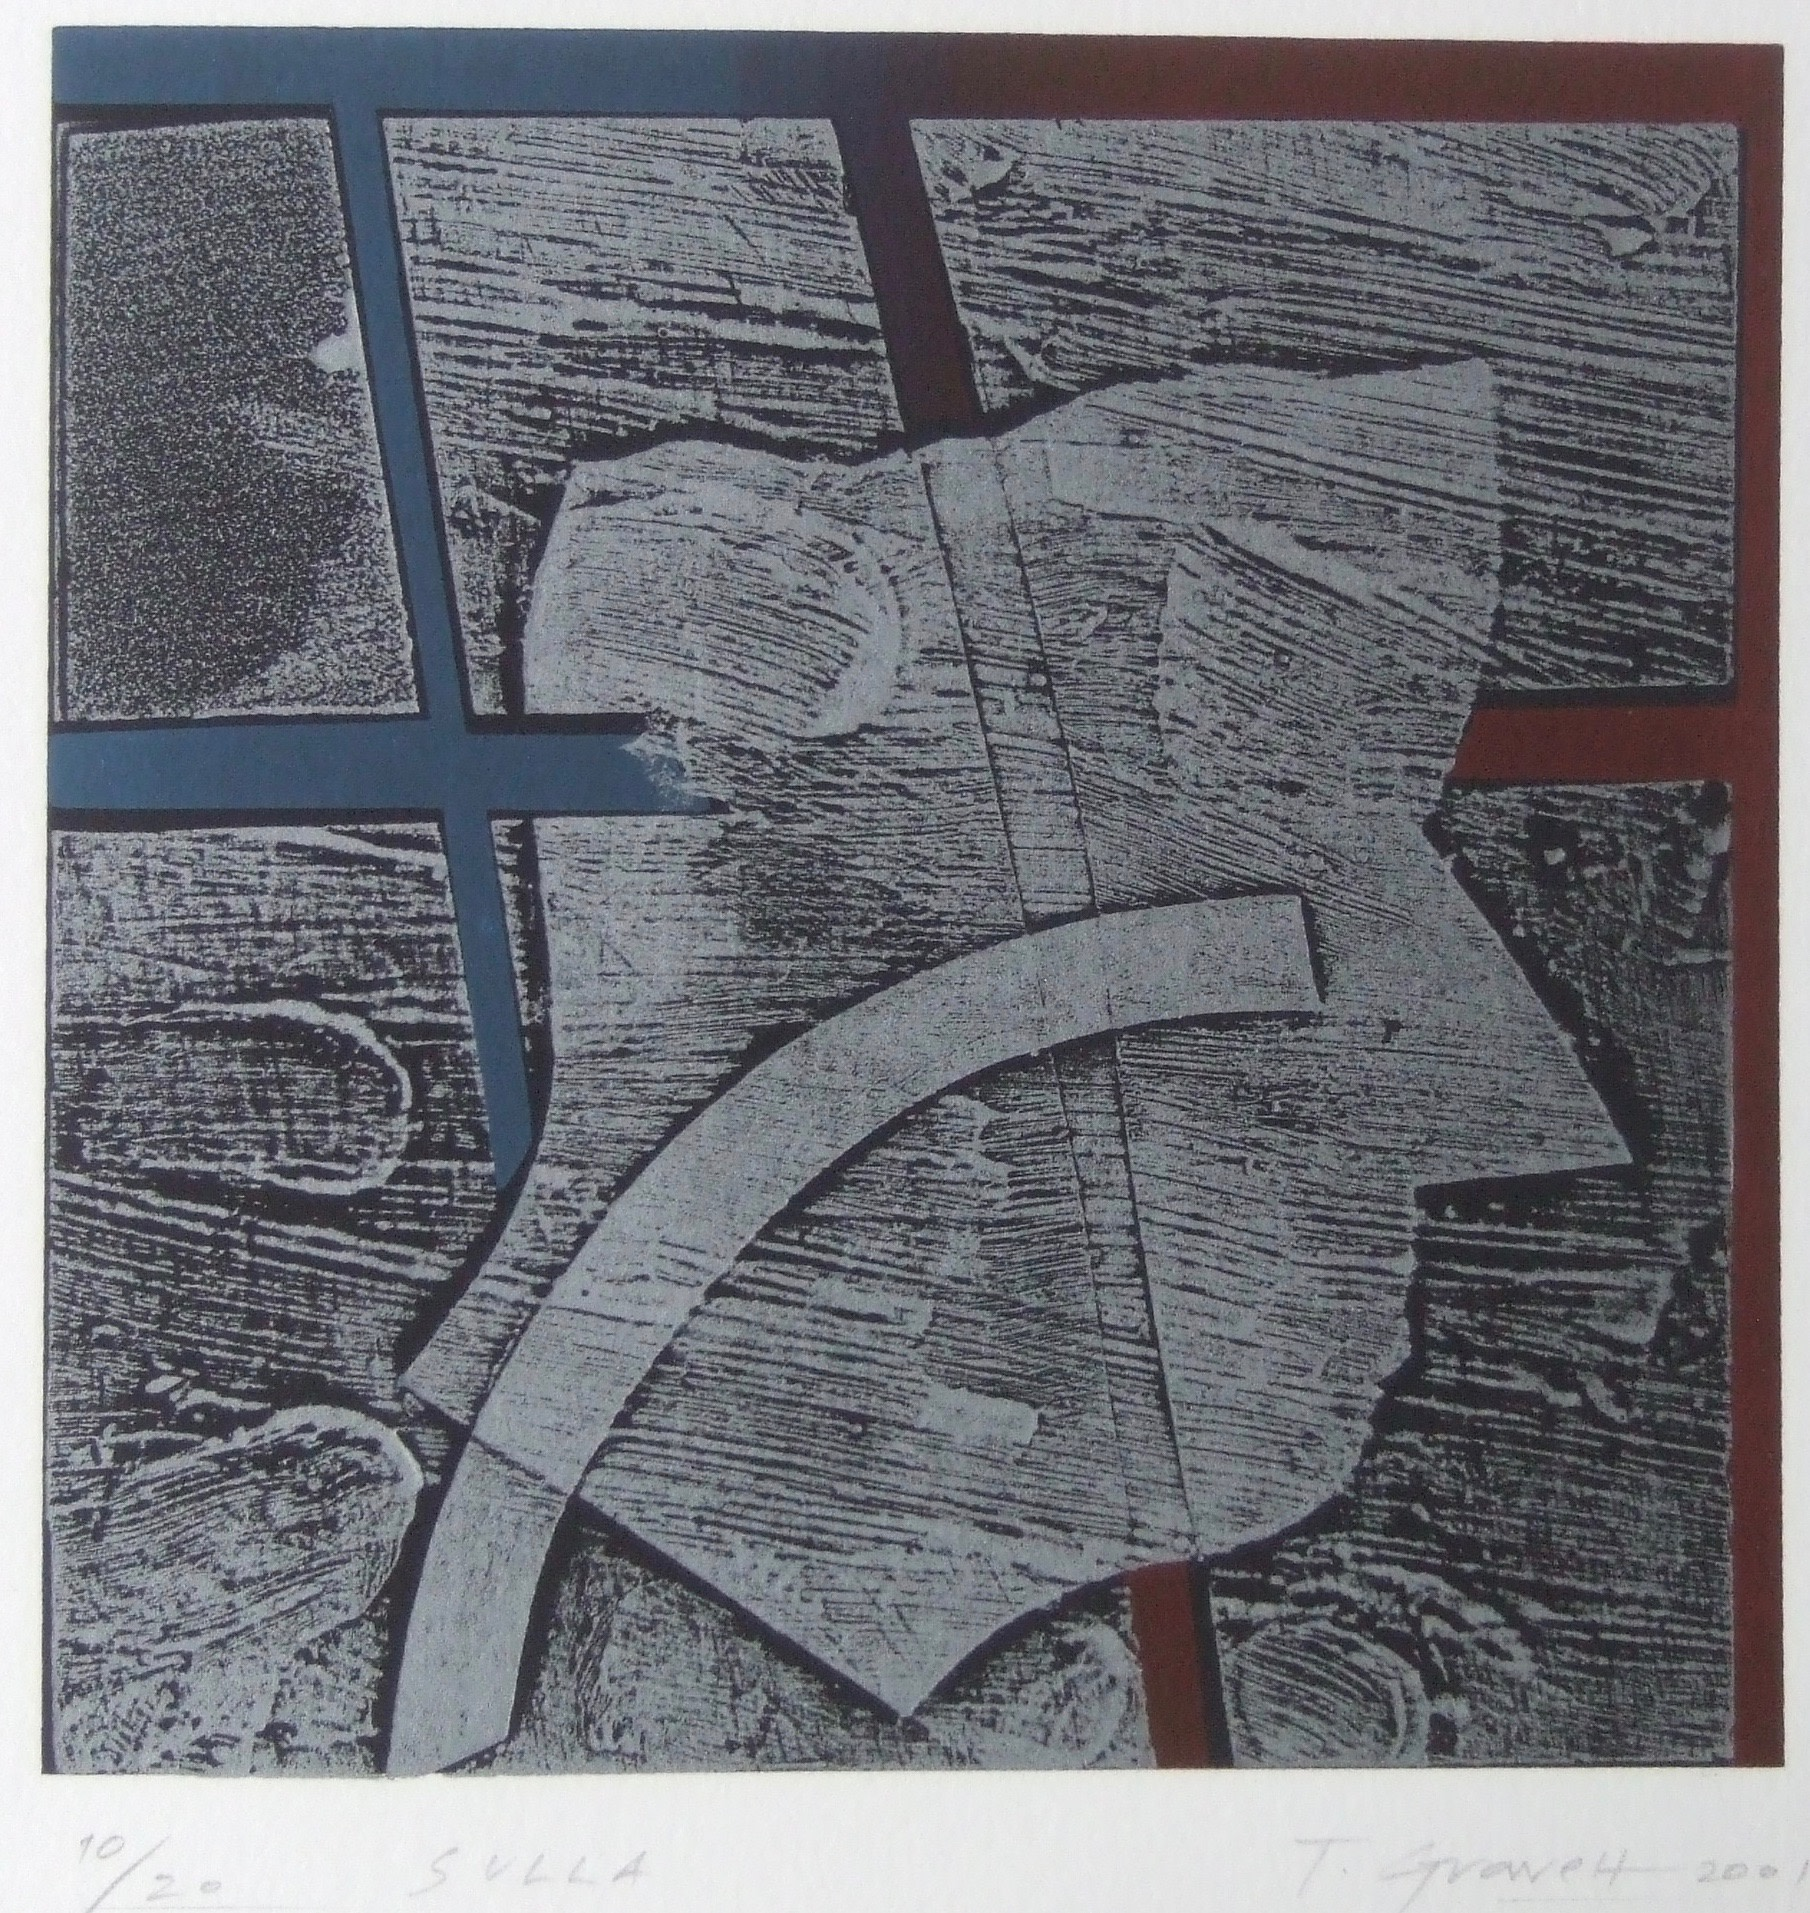 "<span class=""link fancybox-details-link""><a href=""/exhibitions/23/works/artworks_standalone11227/"">View Detail Page</a></span><div class=""artist""><span class=""artist""><strong>Terence Gravett ARE</strong></span></div><div class=""title""><em>Sulla</em></div><div class=""medium"">wood block print with gesso</div><div class=""dimensions"">26 x 26cm paper size<br>14 x 14cm image size</div><div class=""edition_details"">edition of 20</div>"